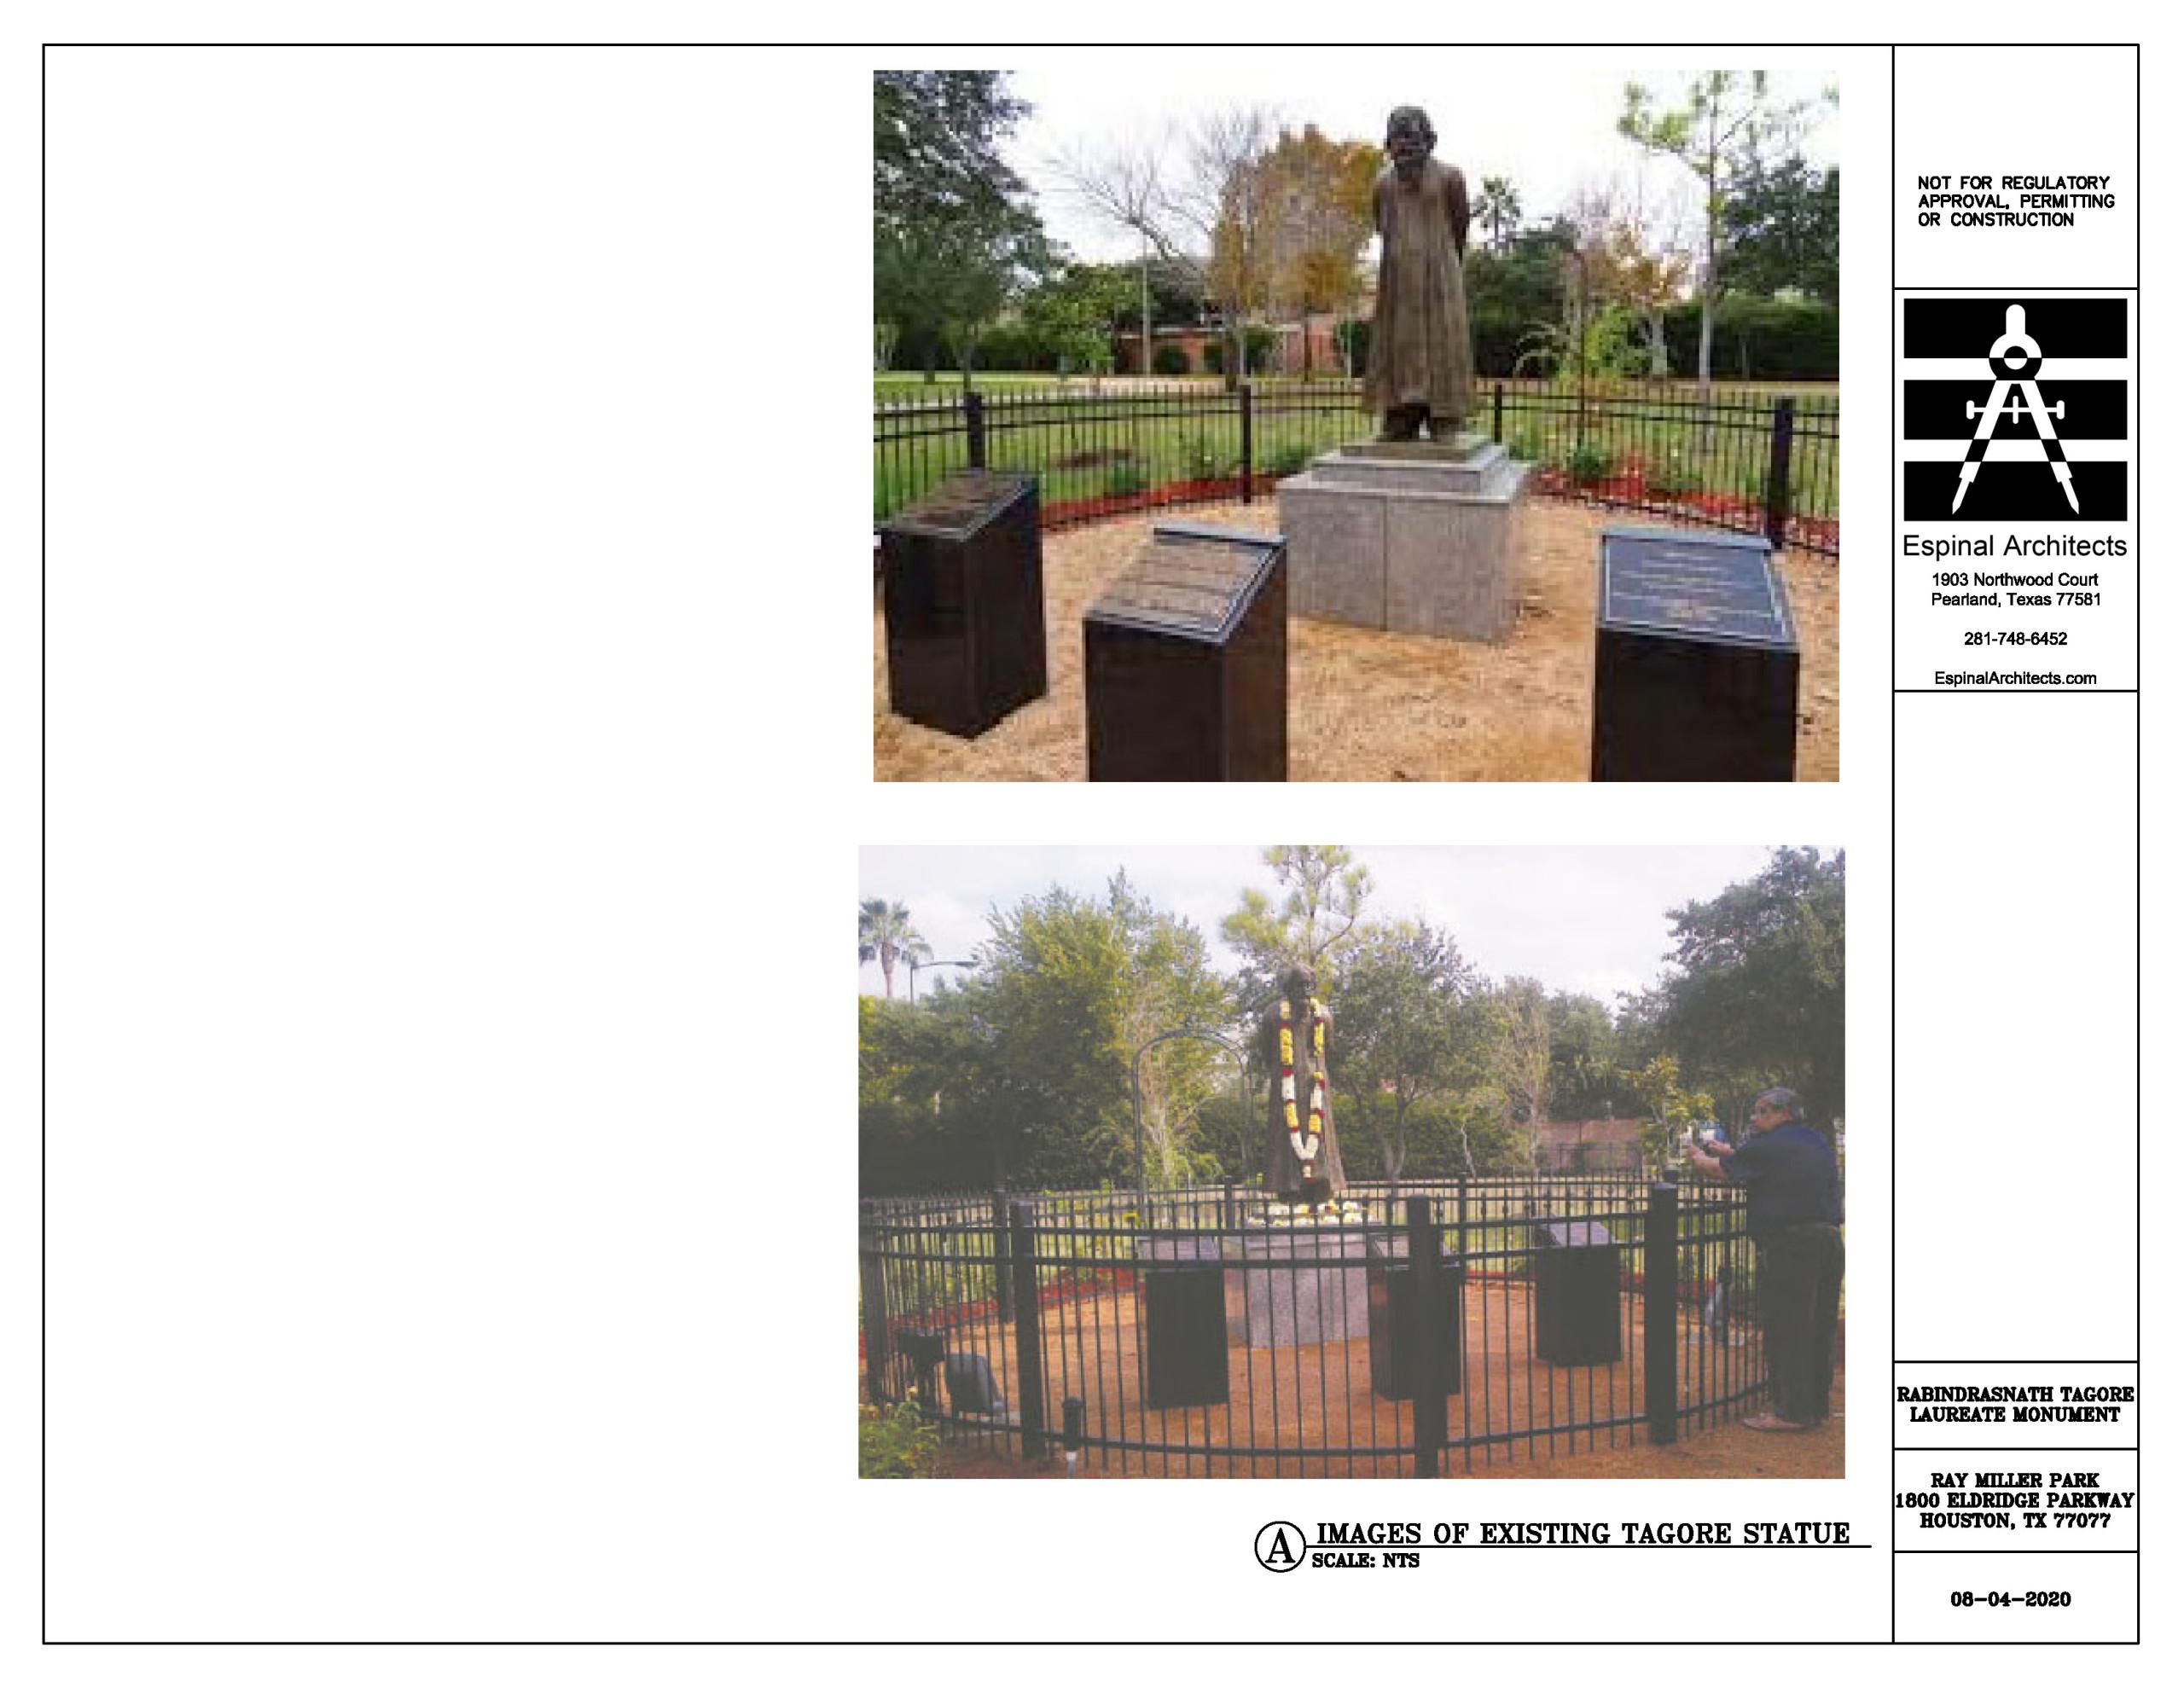 Rabindranath Tagore Laureate Monument